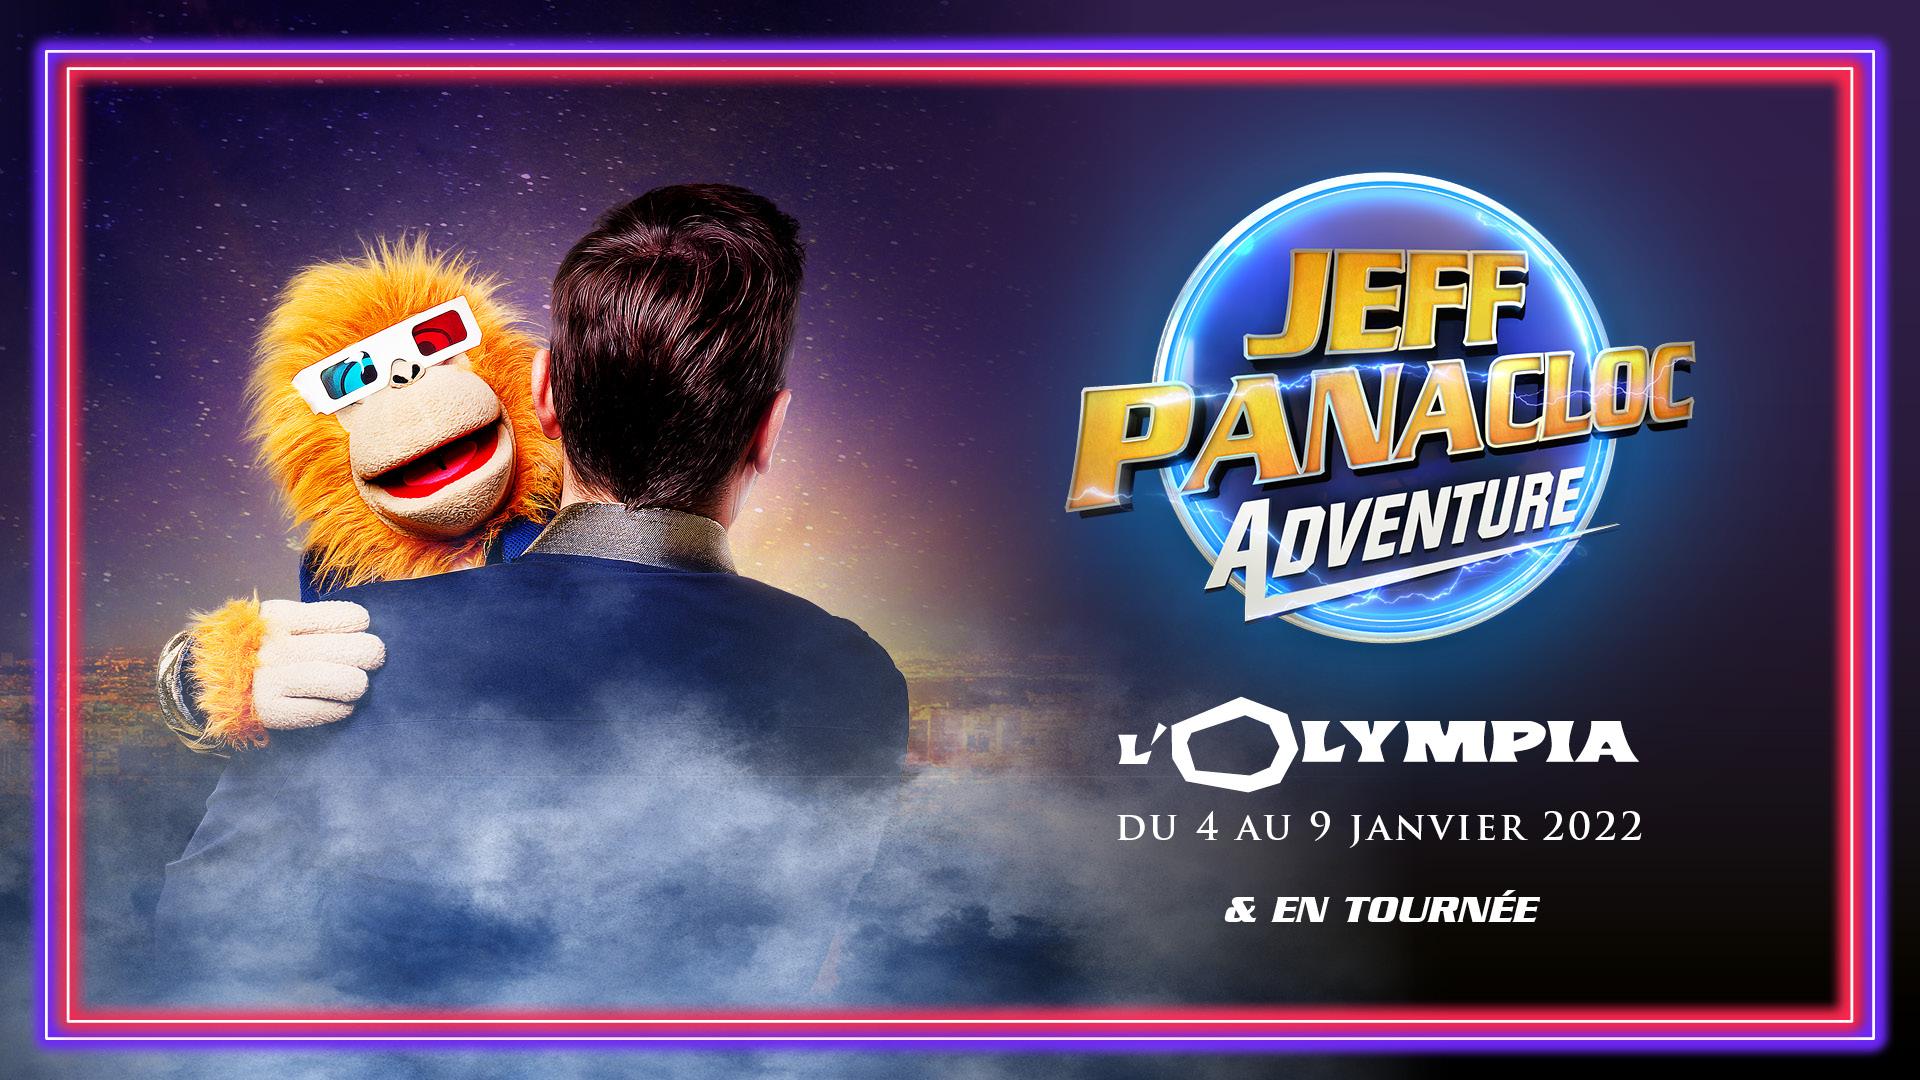 Jeff Panacloc Adventure